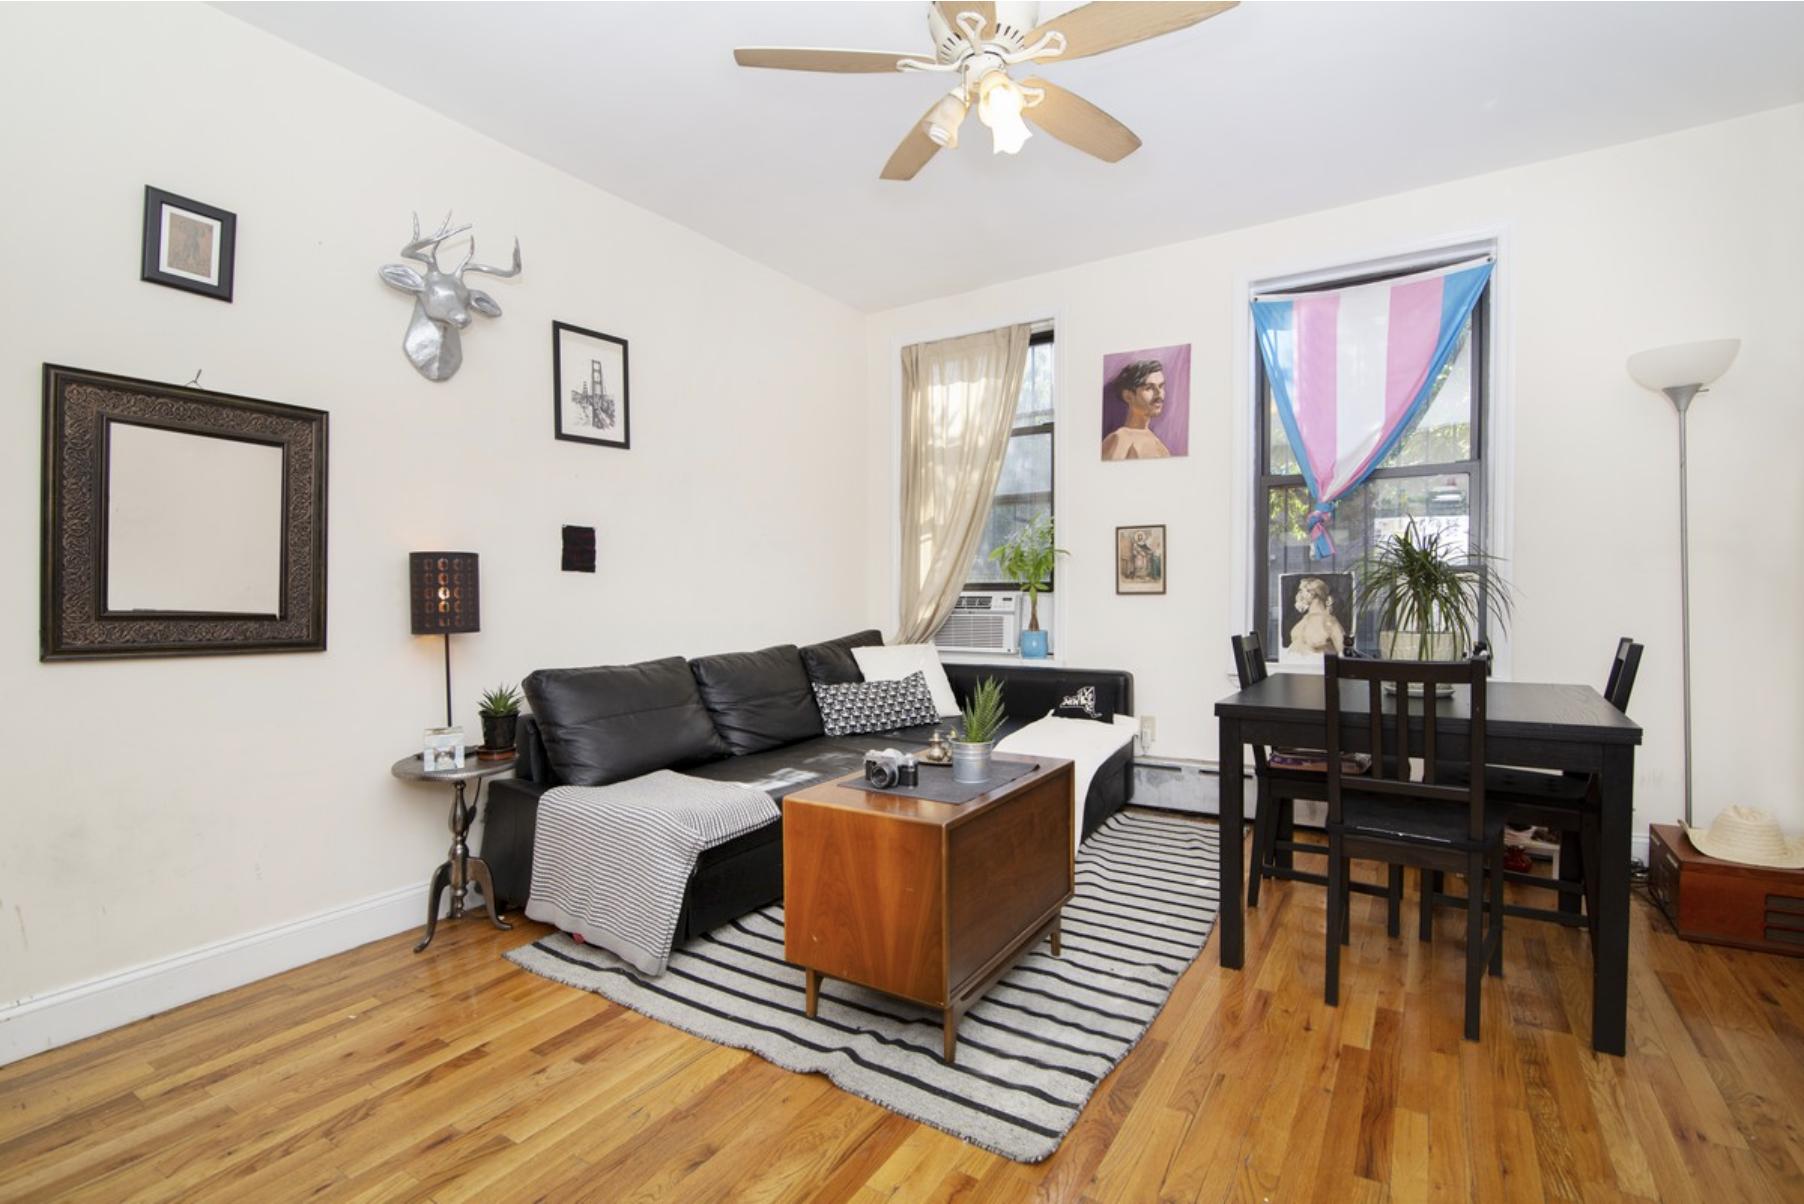 $2,425/month 2.0 BD | 1.0 BA | 711 SF  Bedford Stuyvesant  447 Classon Avenue